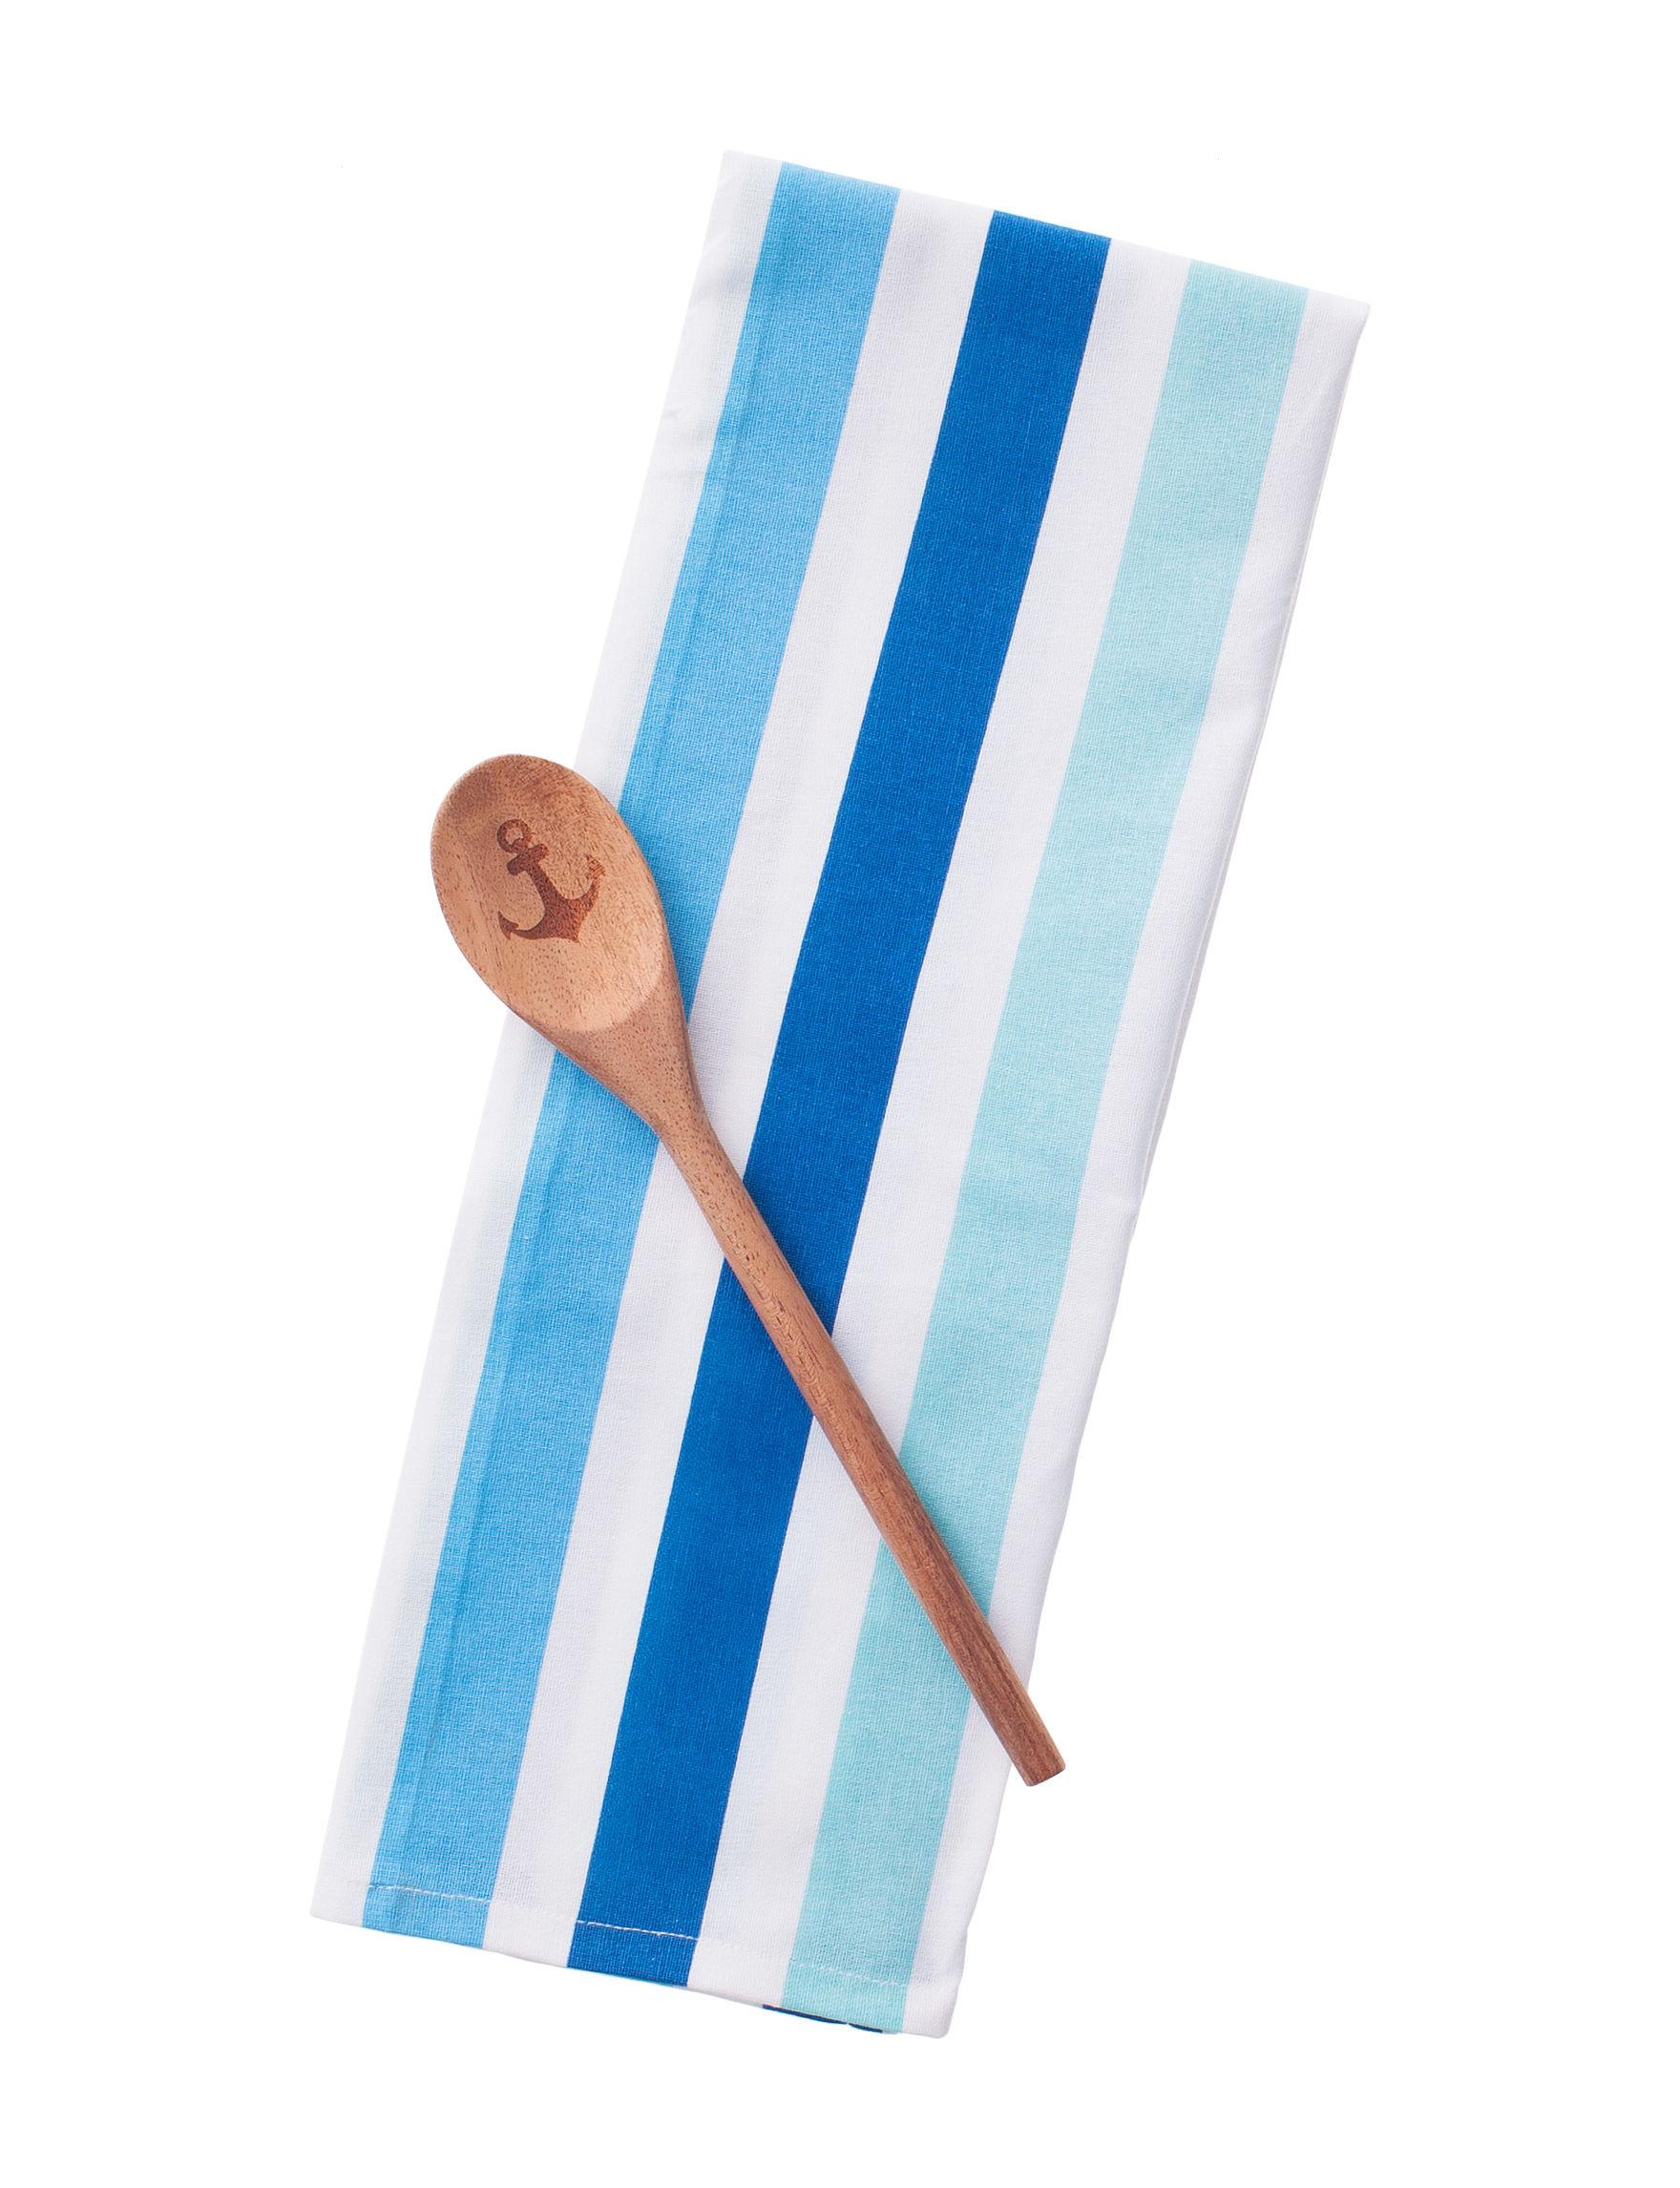 Dennis East White / Blue Dish Towels Kitchen Utensils Kitchen Linens Prep & Tools